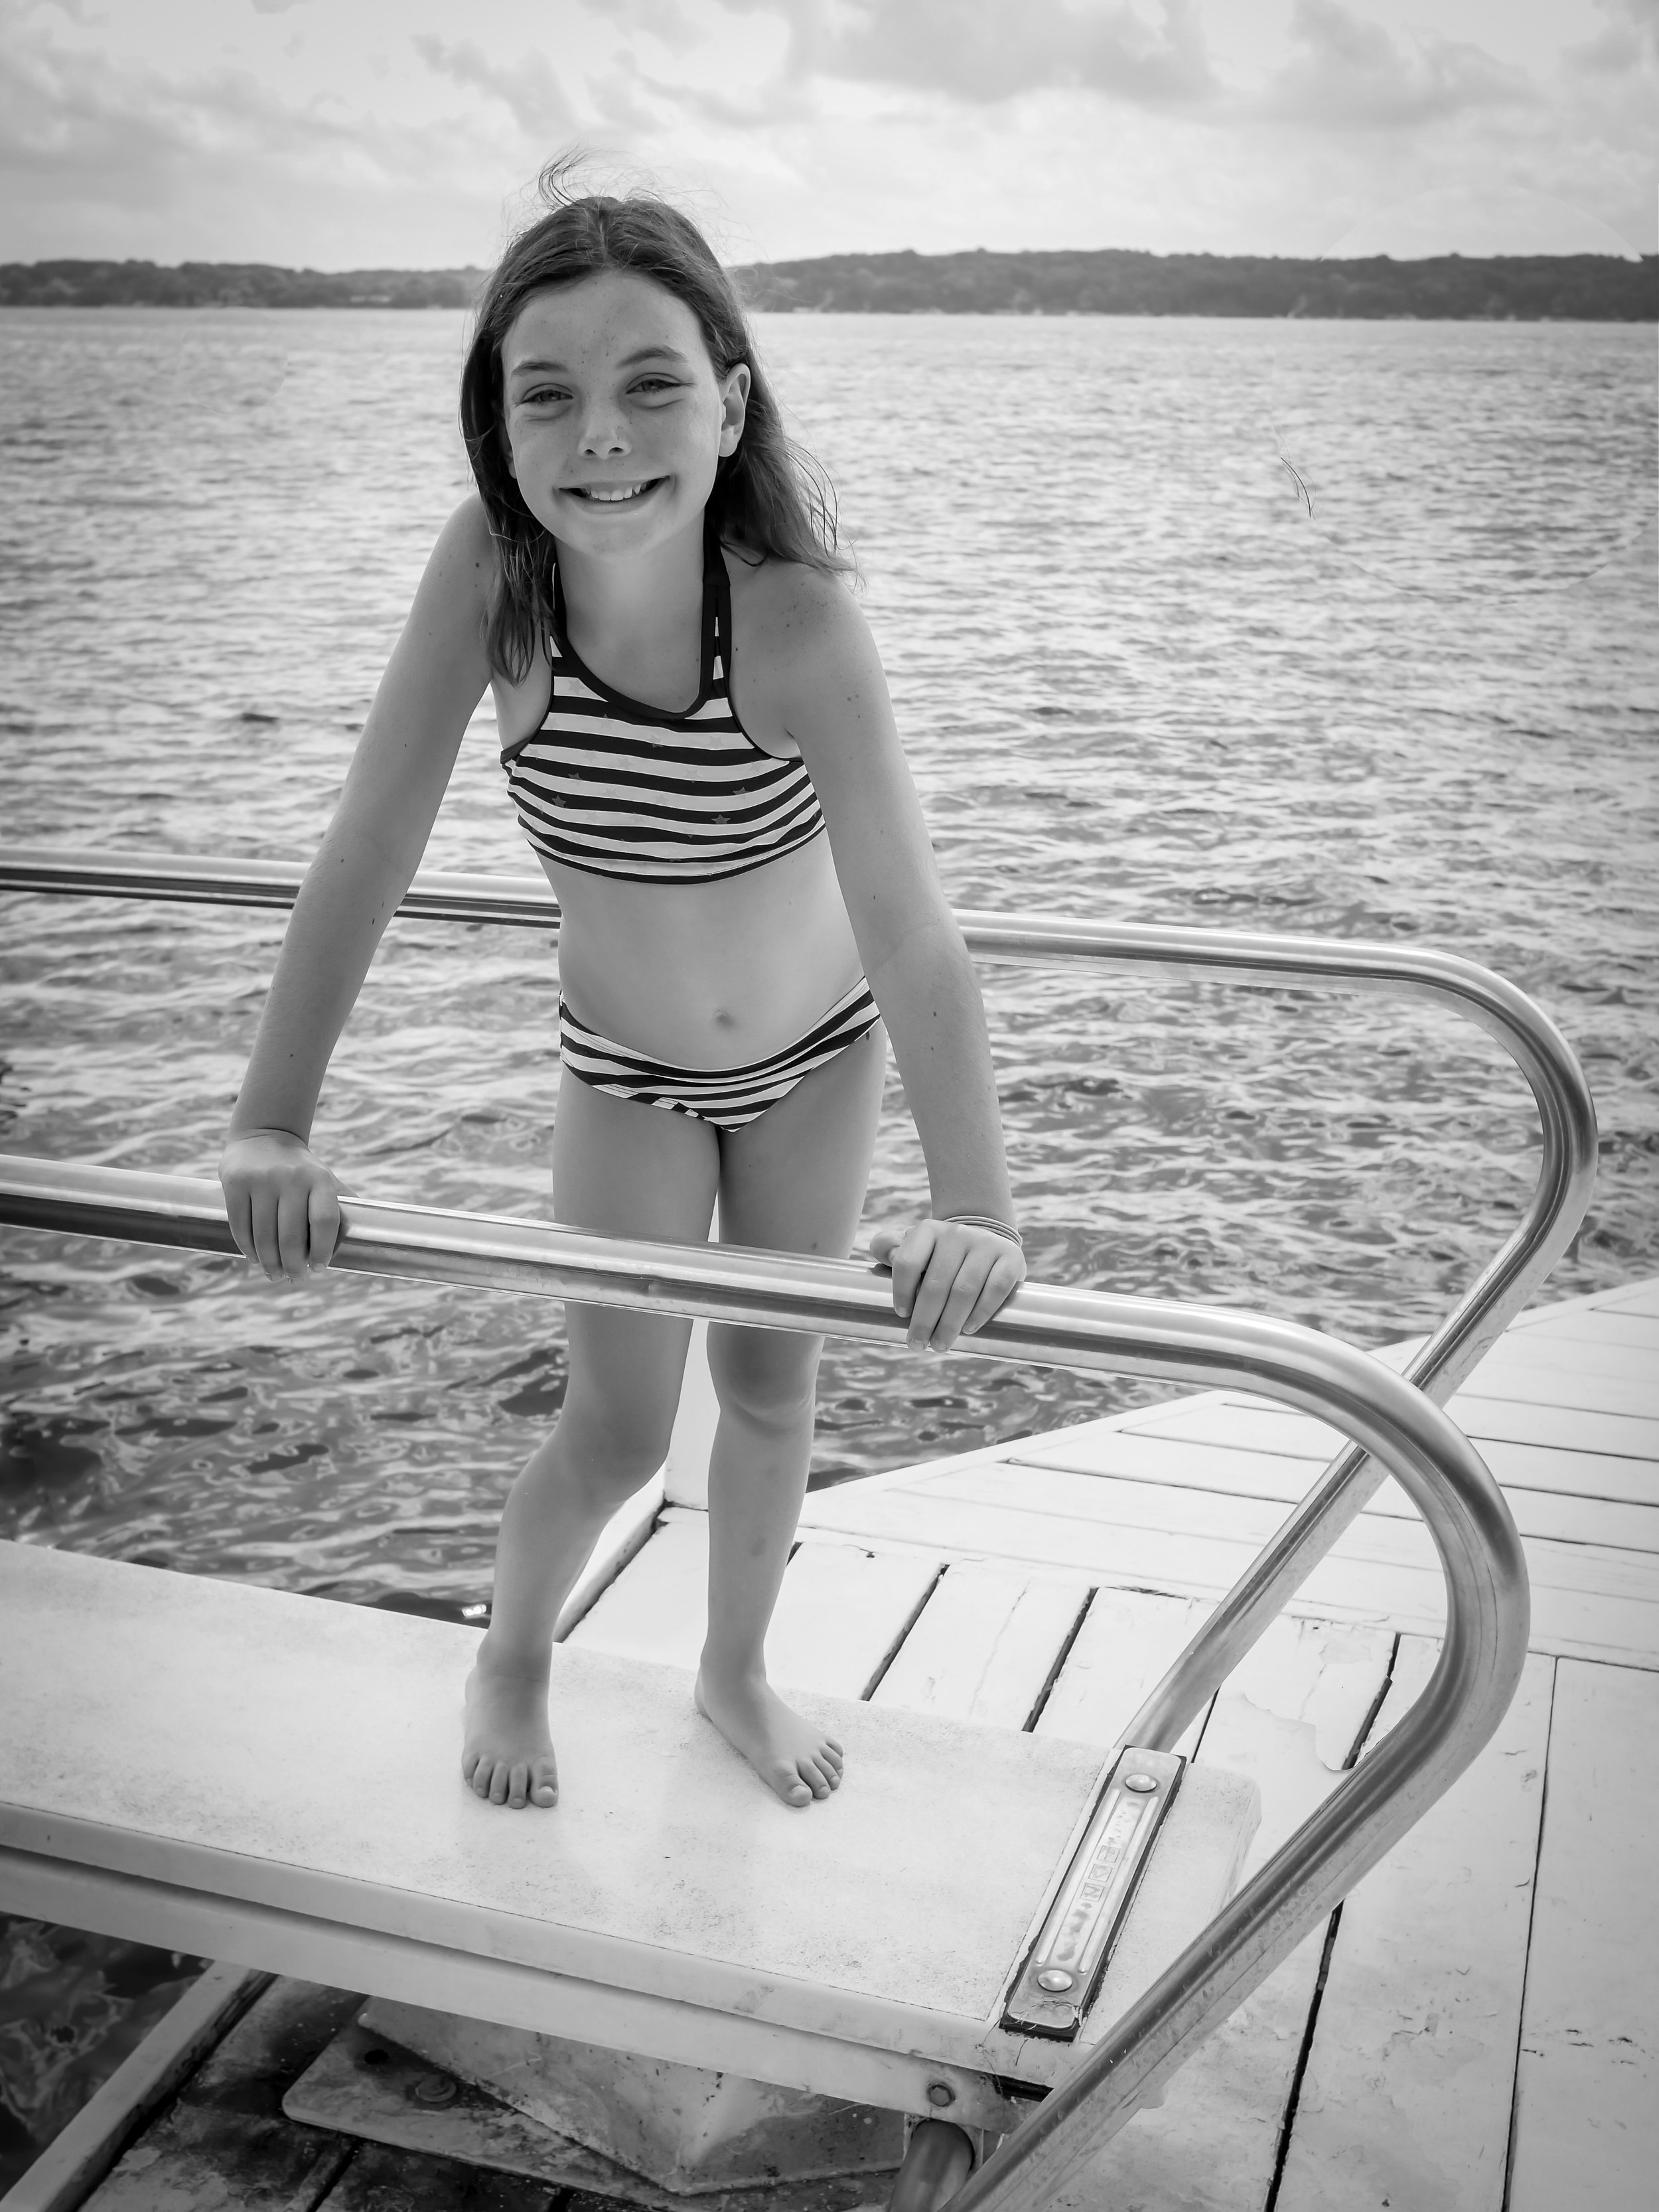 2016 07 28 - Lake Geneva  (9 of 30).jpg